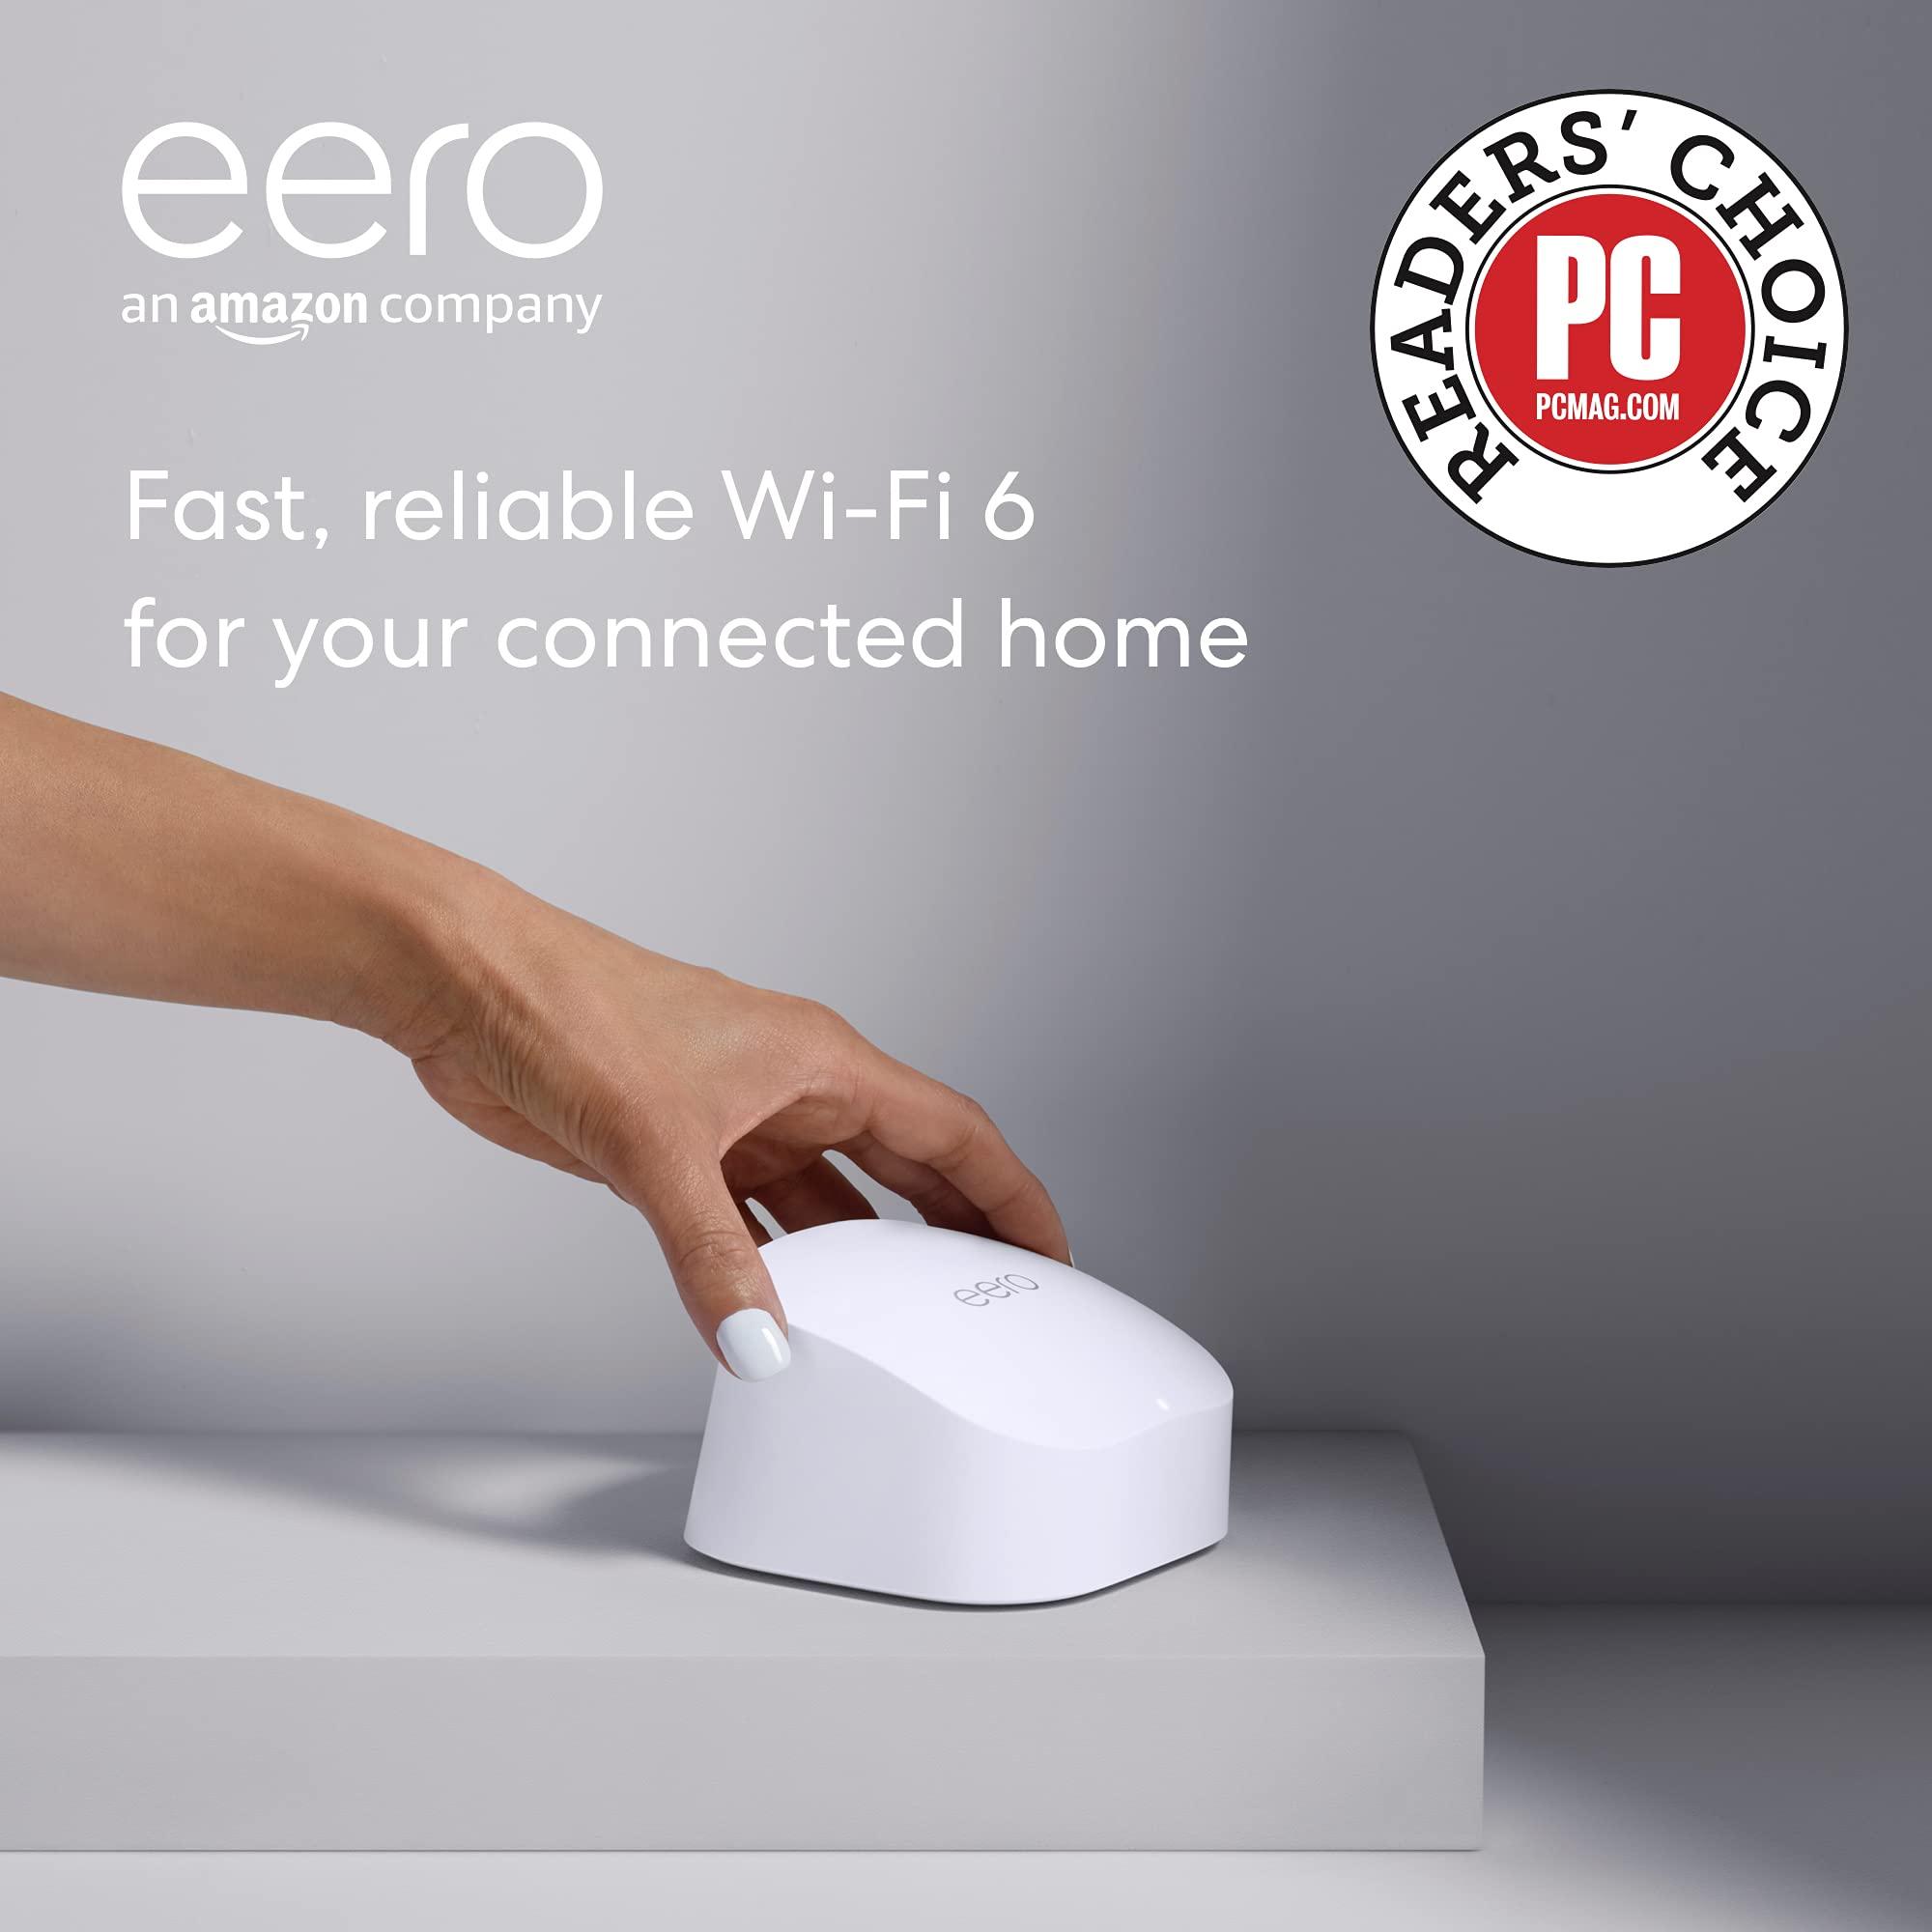 Eero 6 WiFi Mesh 4-Pack Set $280 After Instant Rebate at Costco